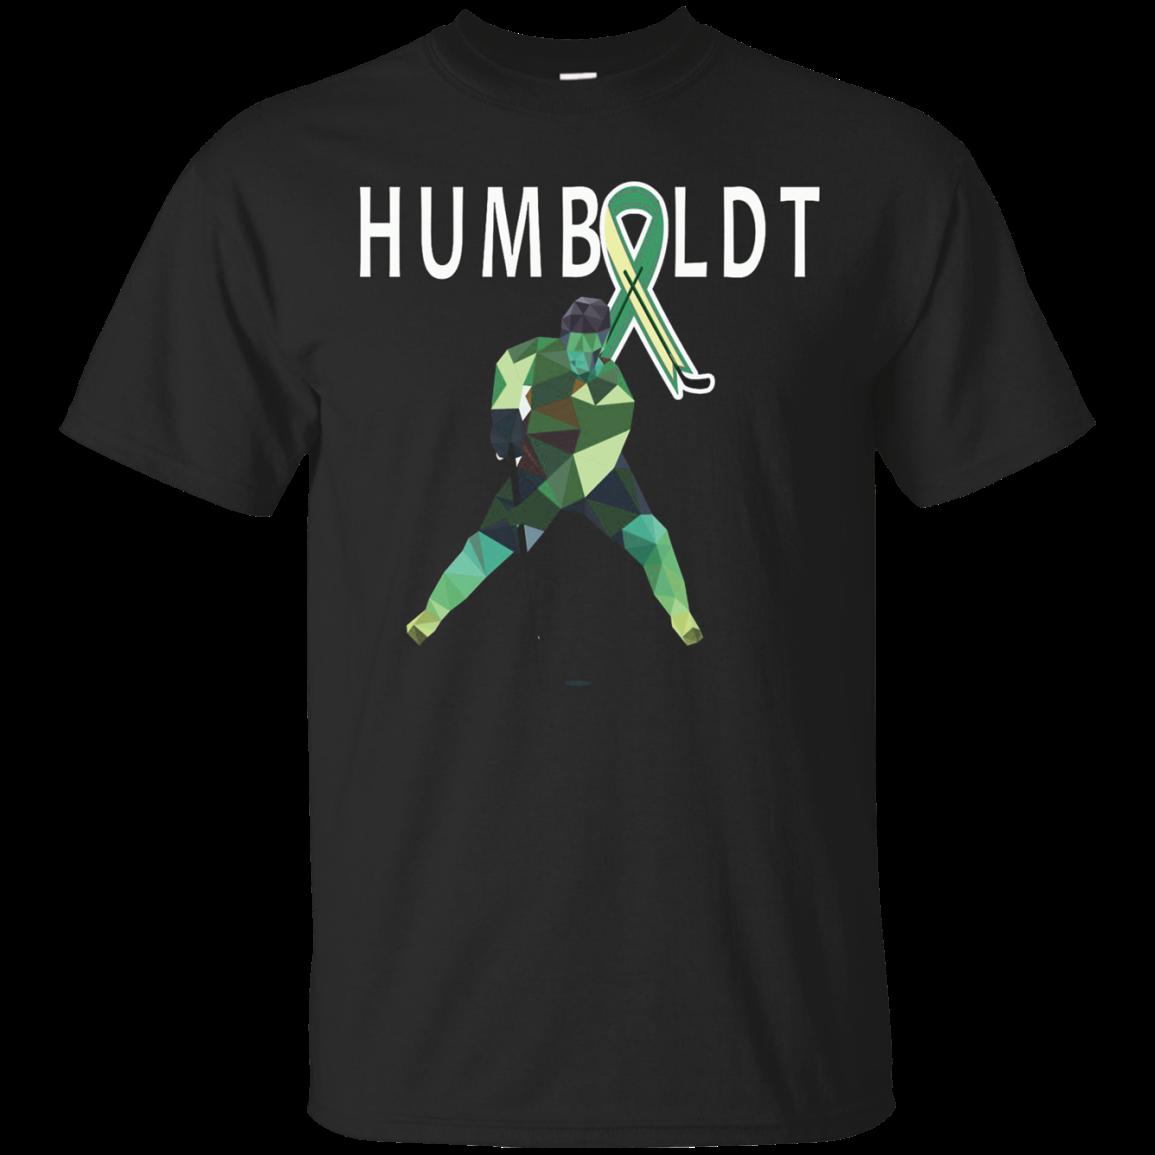 Humboldt Hockey Team Bus Accident Memorial T Shirt Men